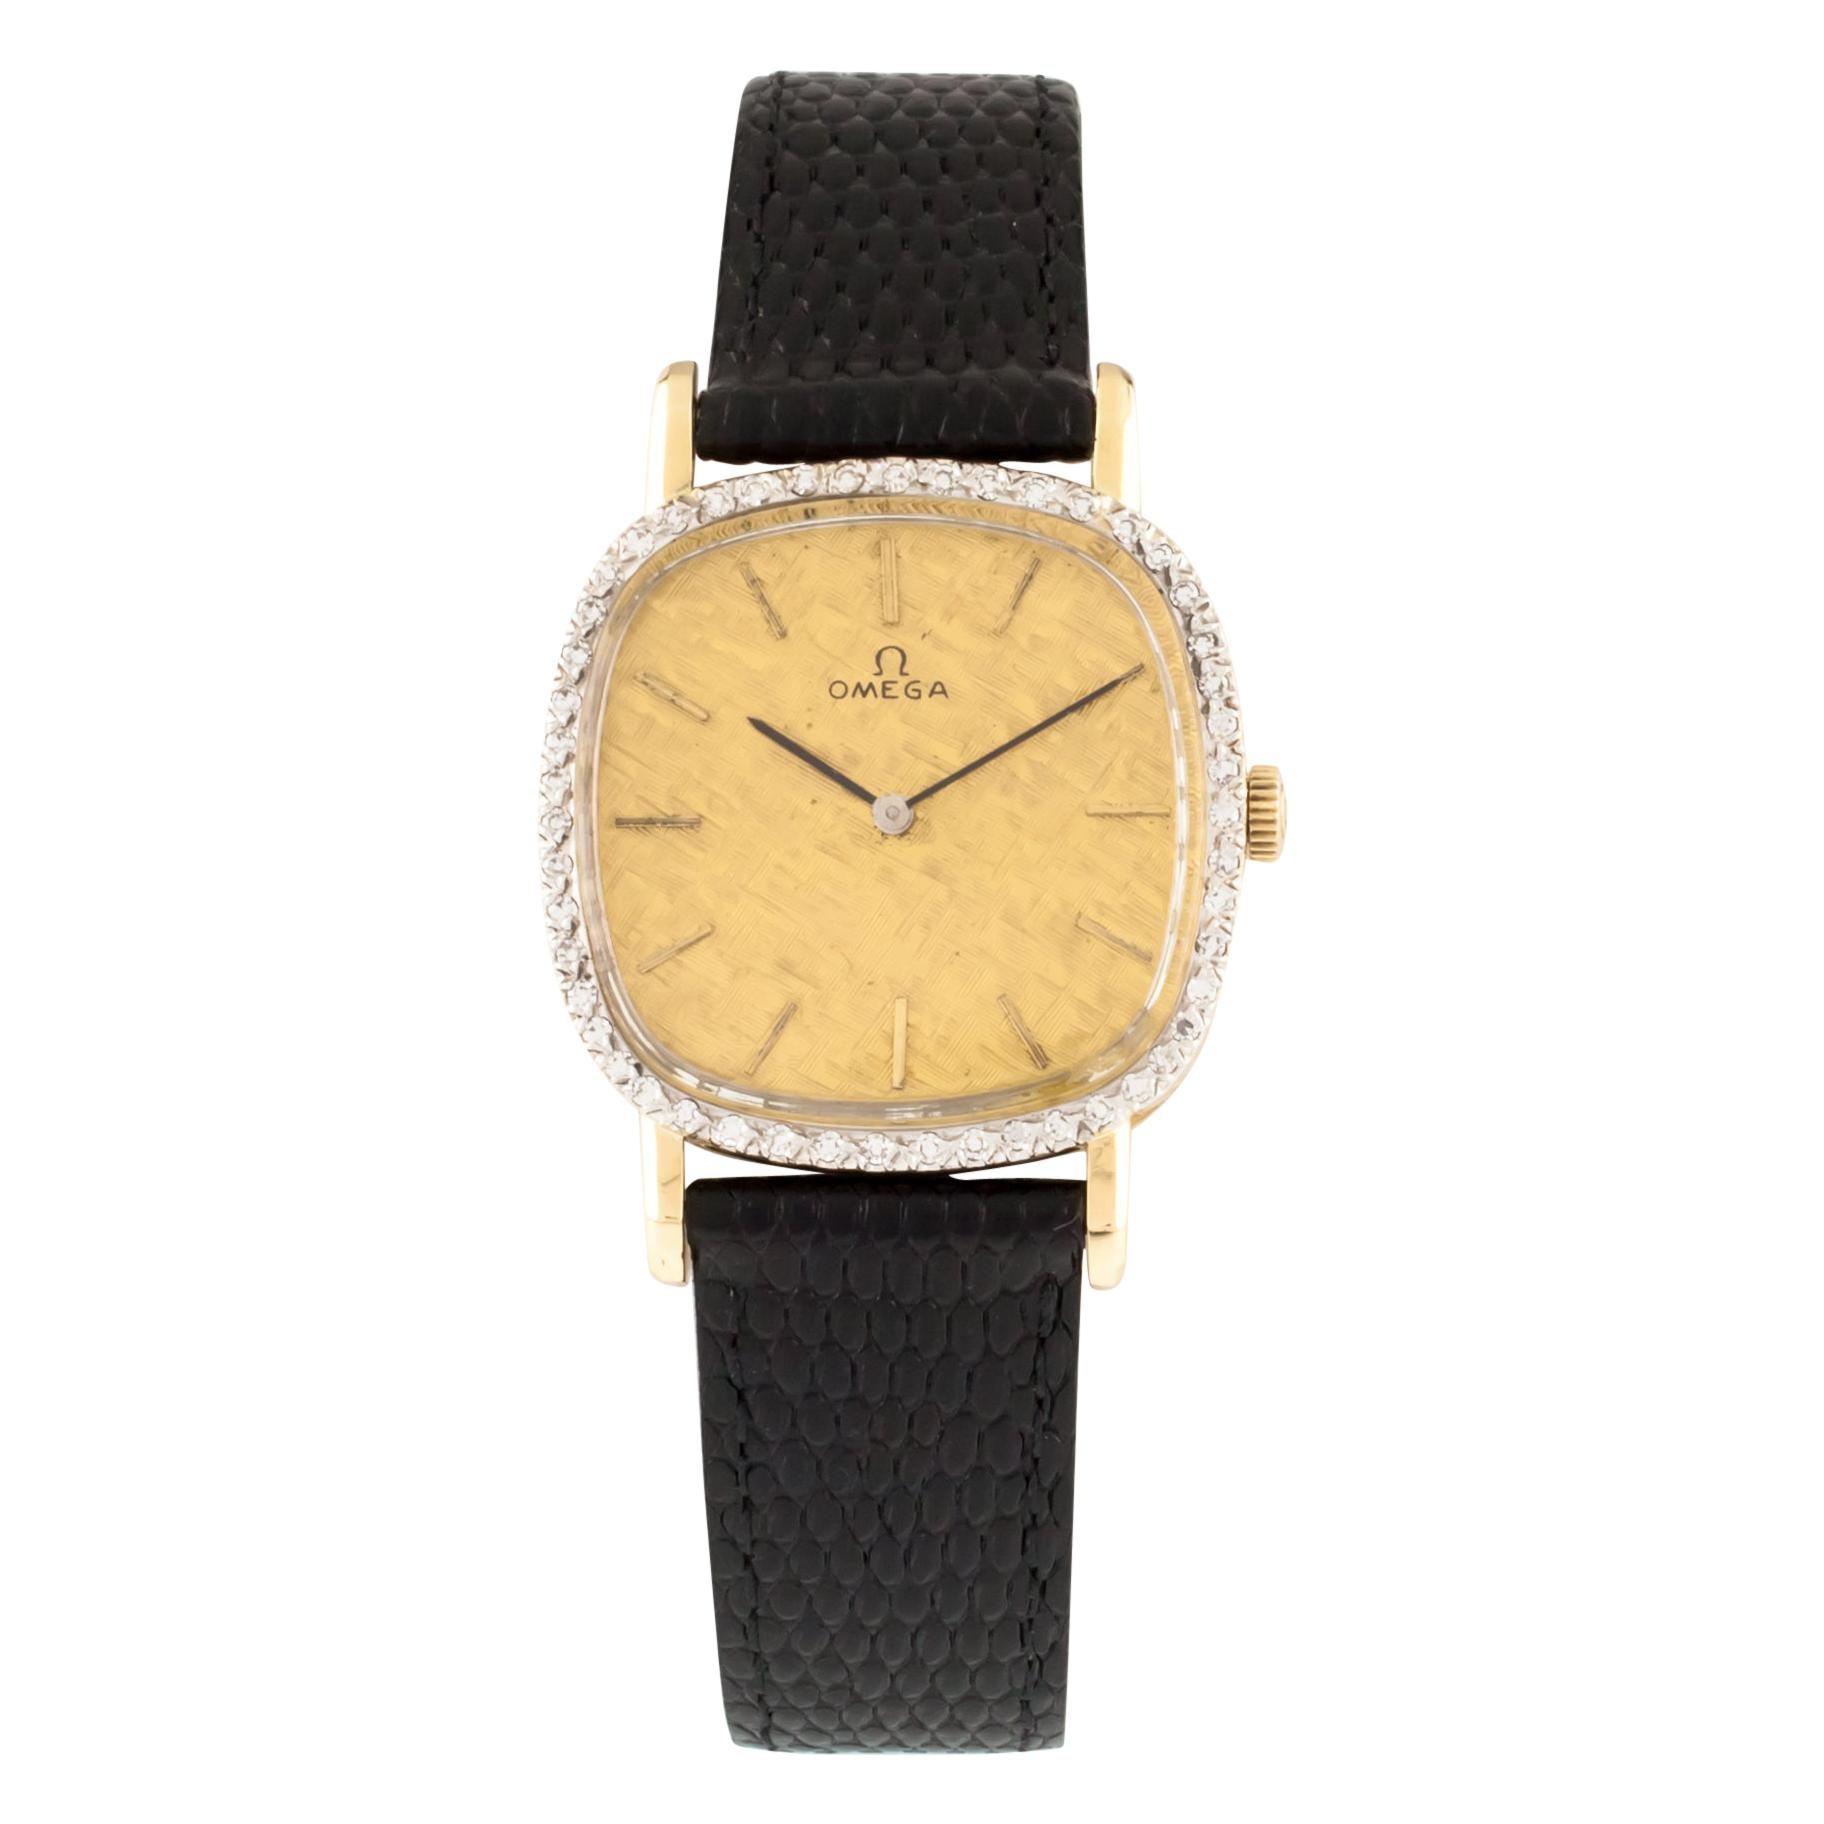 Omega Men's 14 Karat Gold Hand-Winding Watch with Diamond Bezel Leather Band